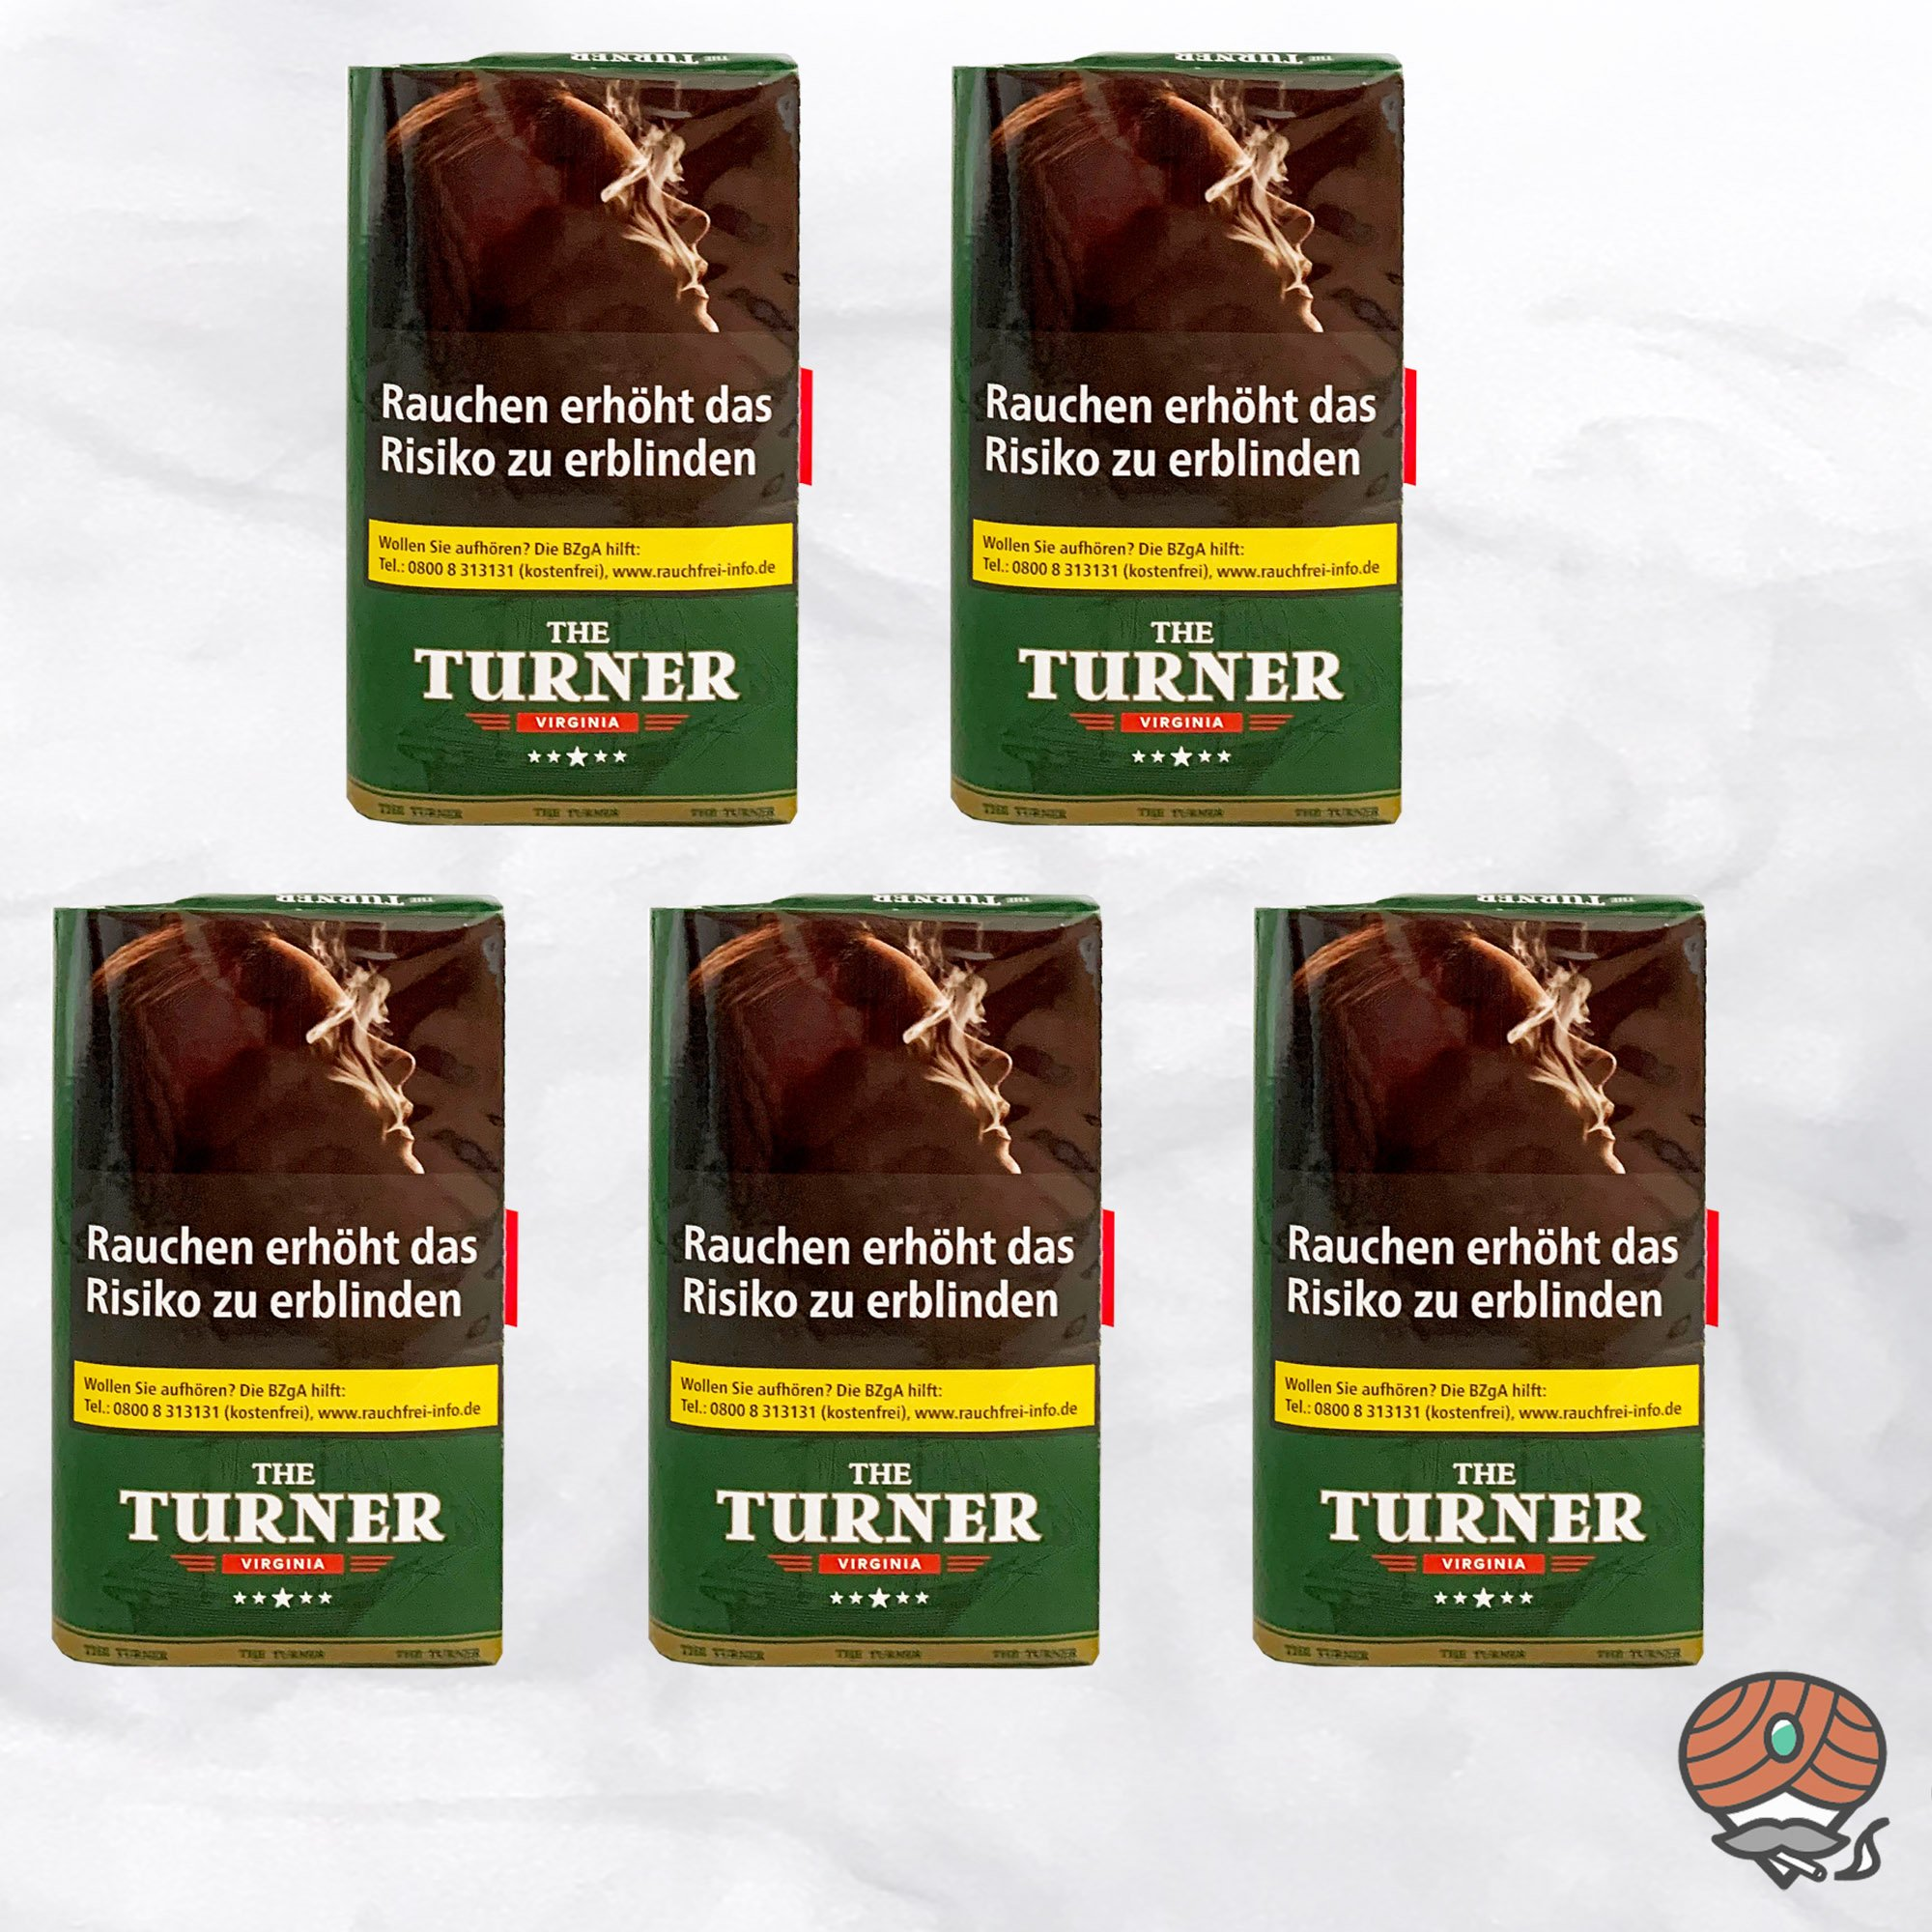 5 x The Turner Virginia Drehtabak Pouch 40 g